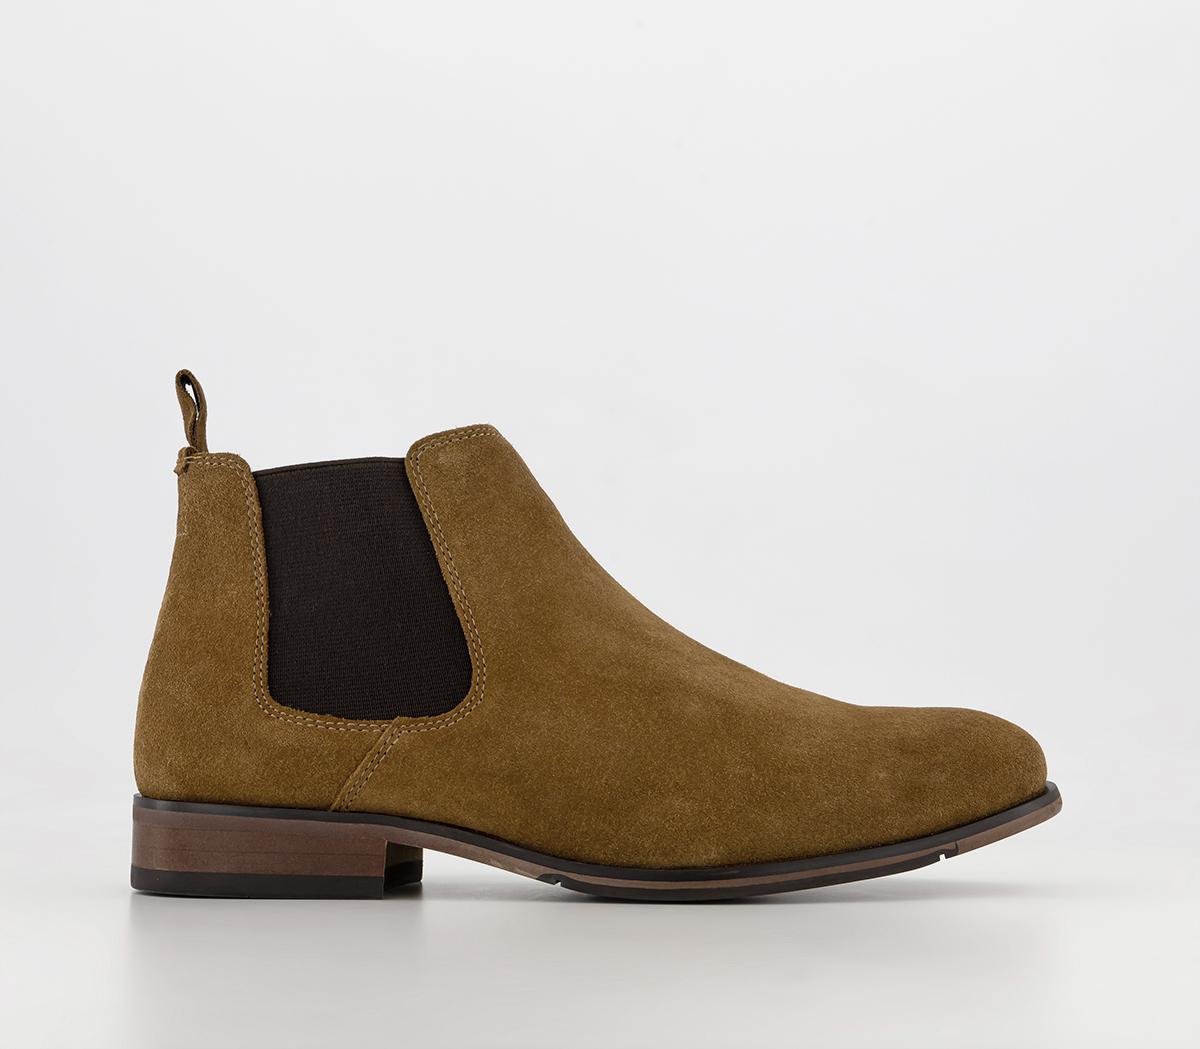 Barkley 2 Chelsea Boots